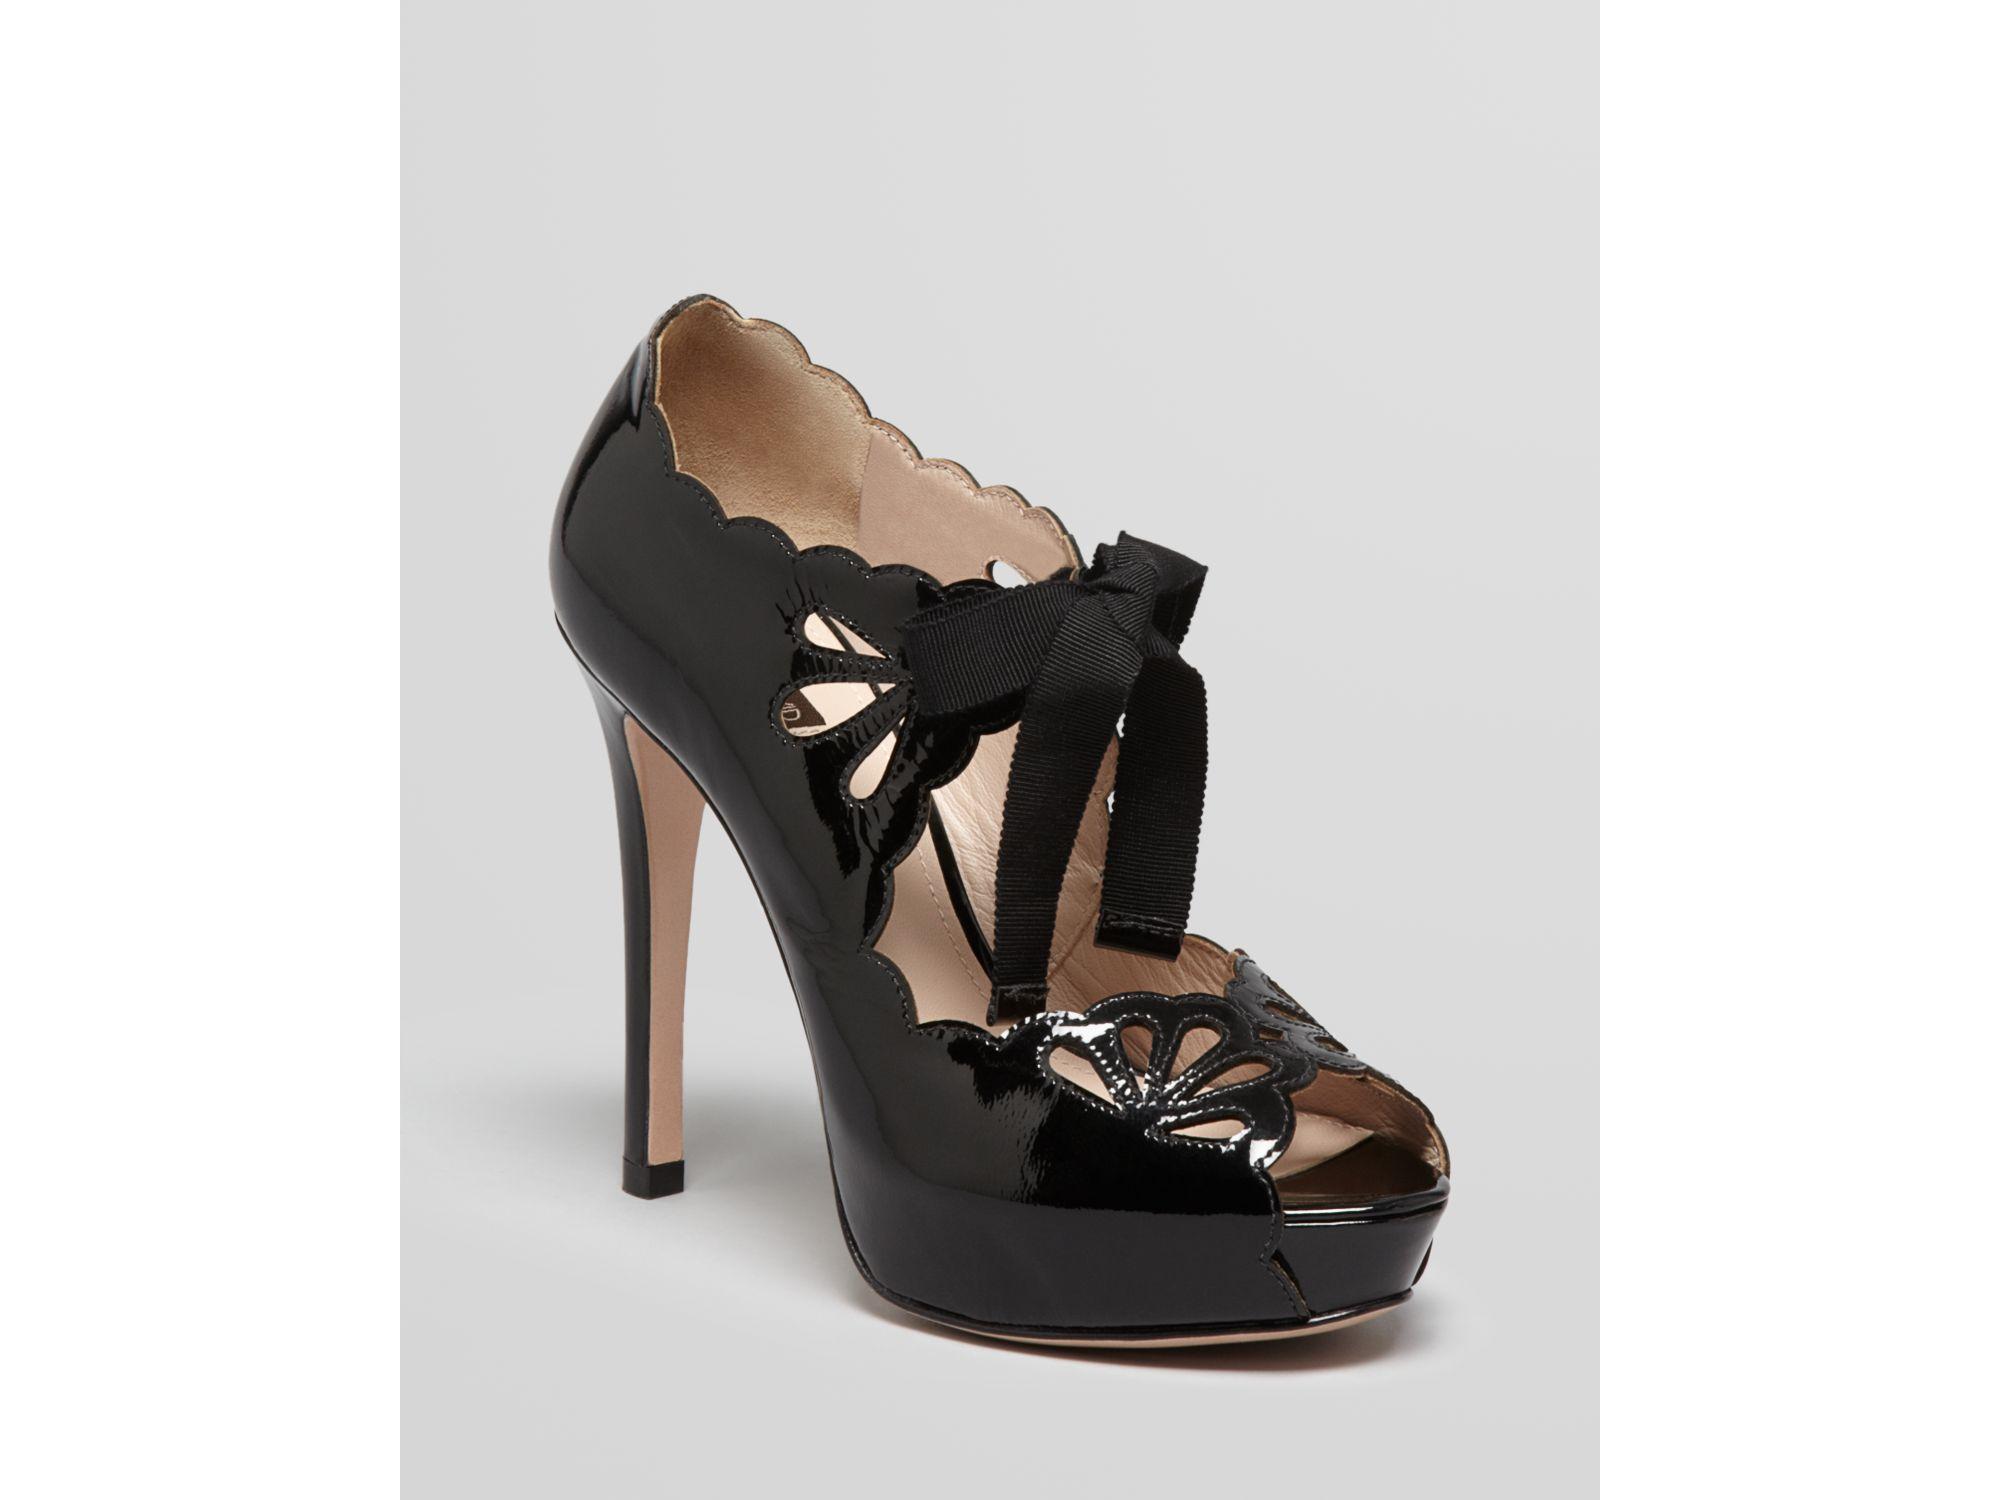 76e4373f0a3 Lyst - Joan   David Peep Toe Platform Pumps Cicilee High Heel in Black